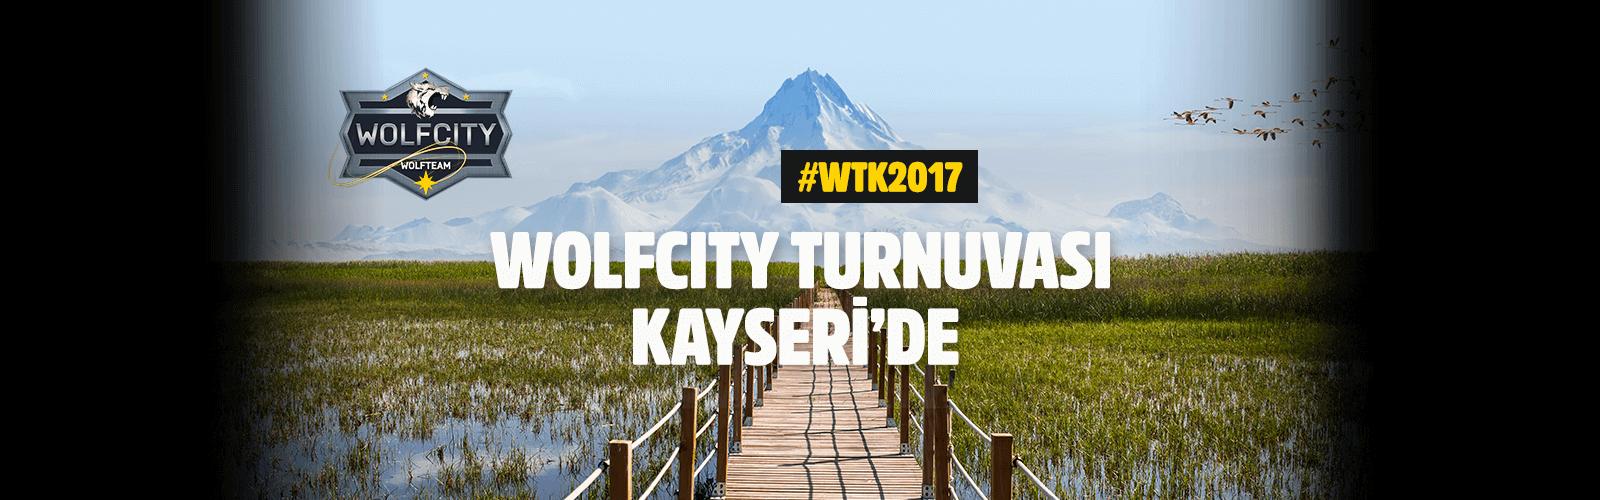 Wolfcity Kayseri'de!